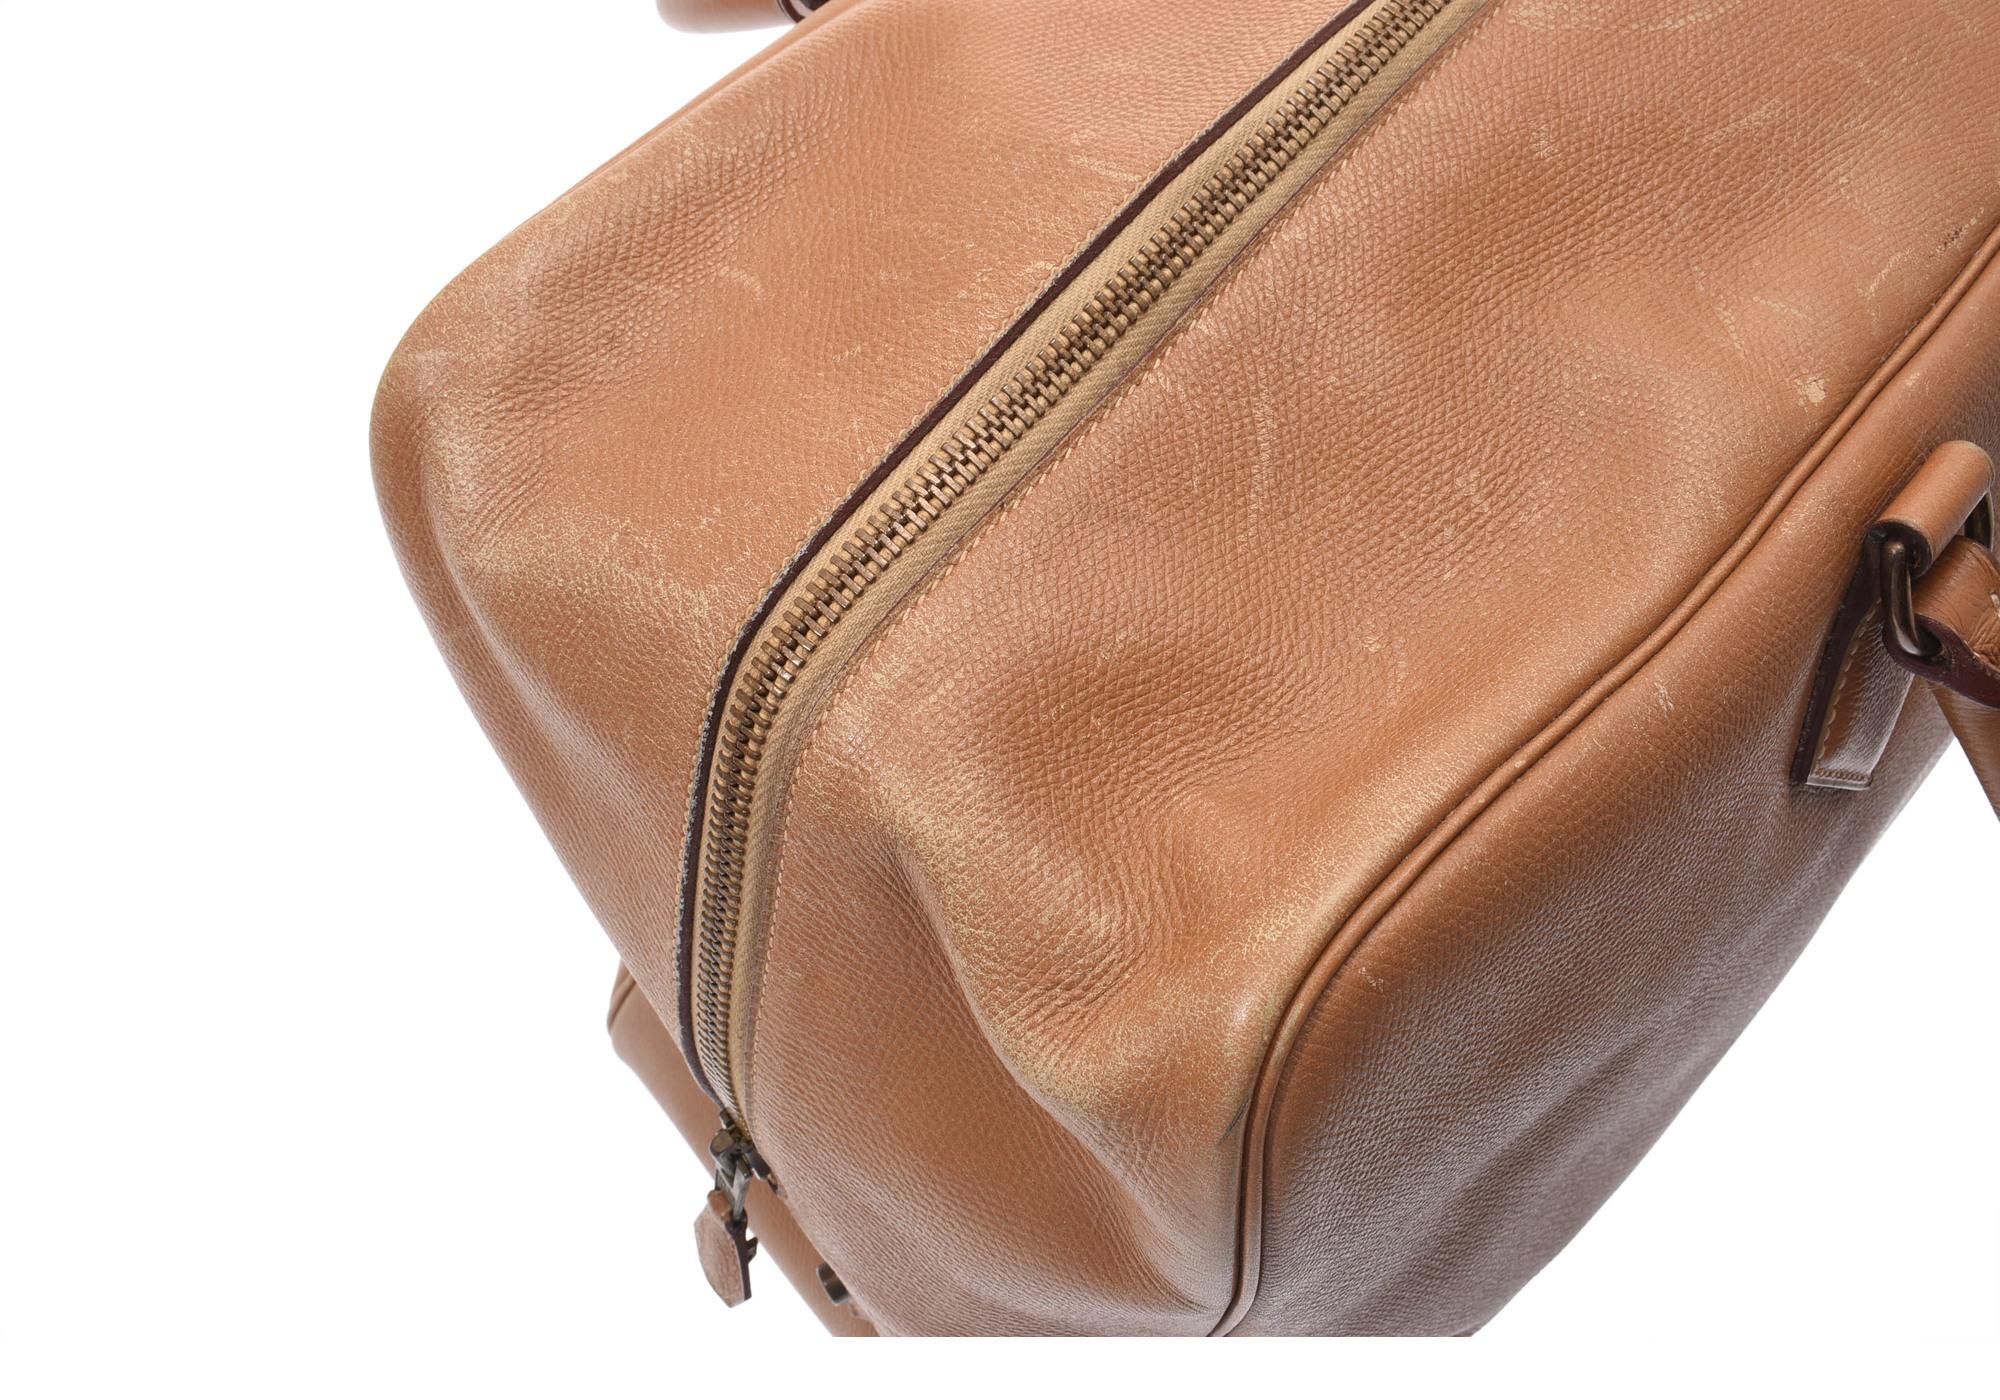 9067d92cfa71 Authentic Hermes Plume 45 Courchevel Leather Bag Natural ...